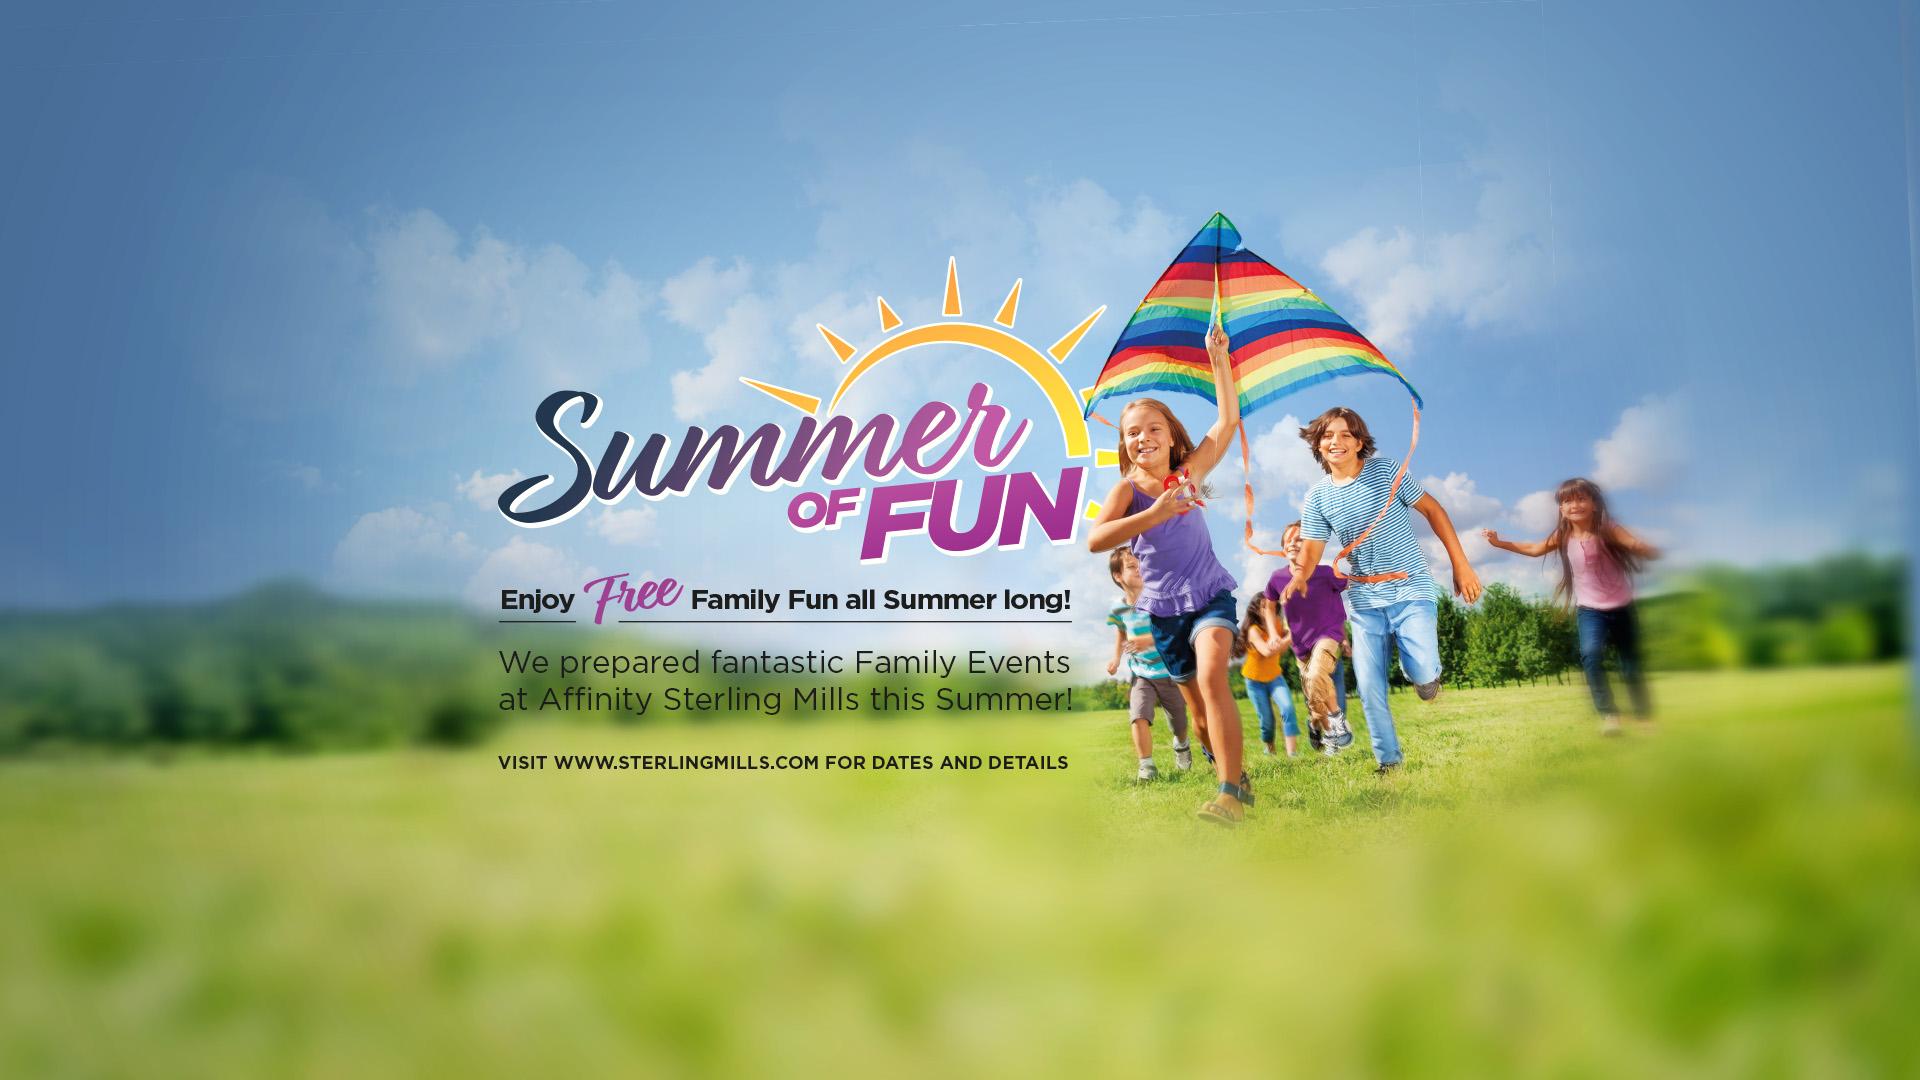 2019-06-12 Summer of Fun - Affinity Sterling Mills - Web Banner.jpg